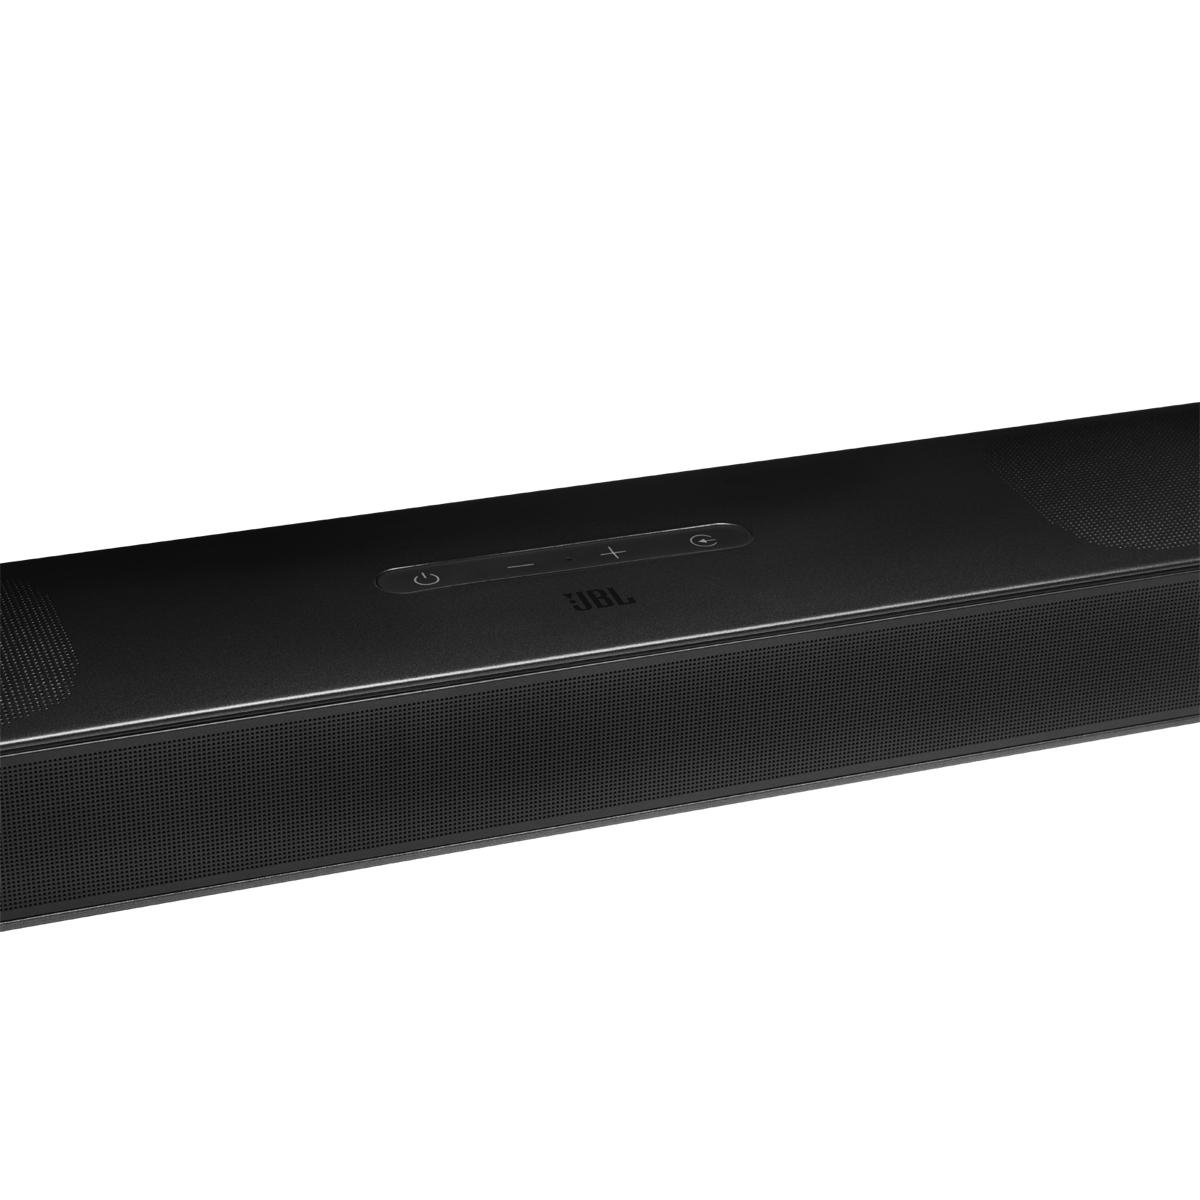 Not Angka Lagu Ces 2021 Soundbar - LG Announces New QNED ...